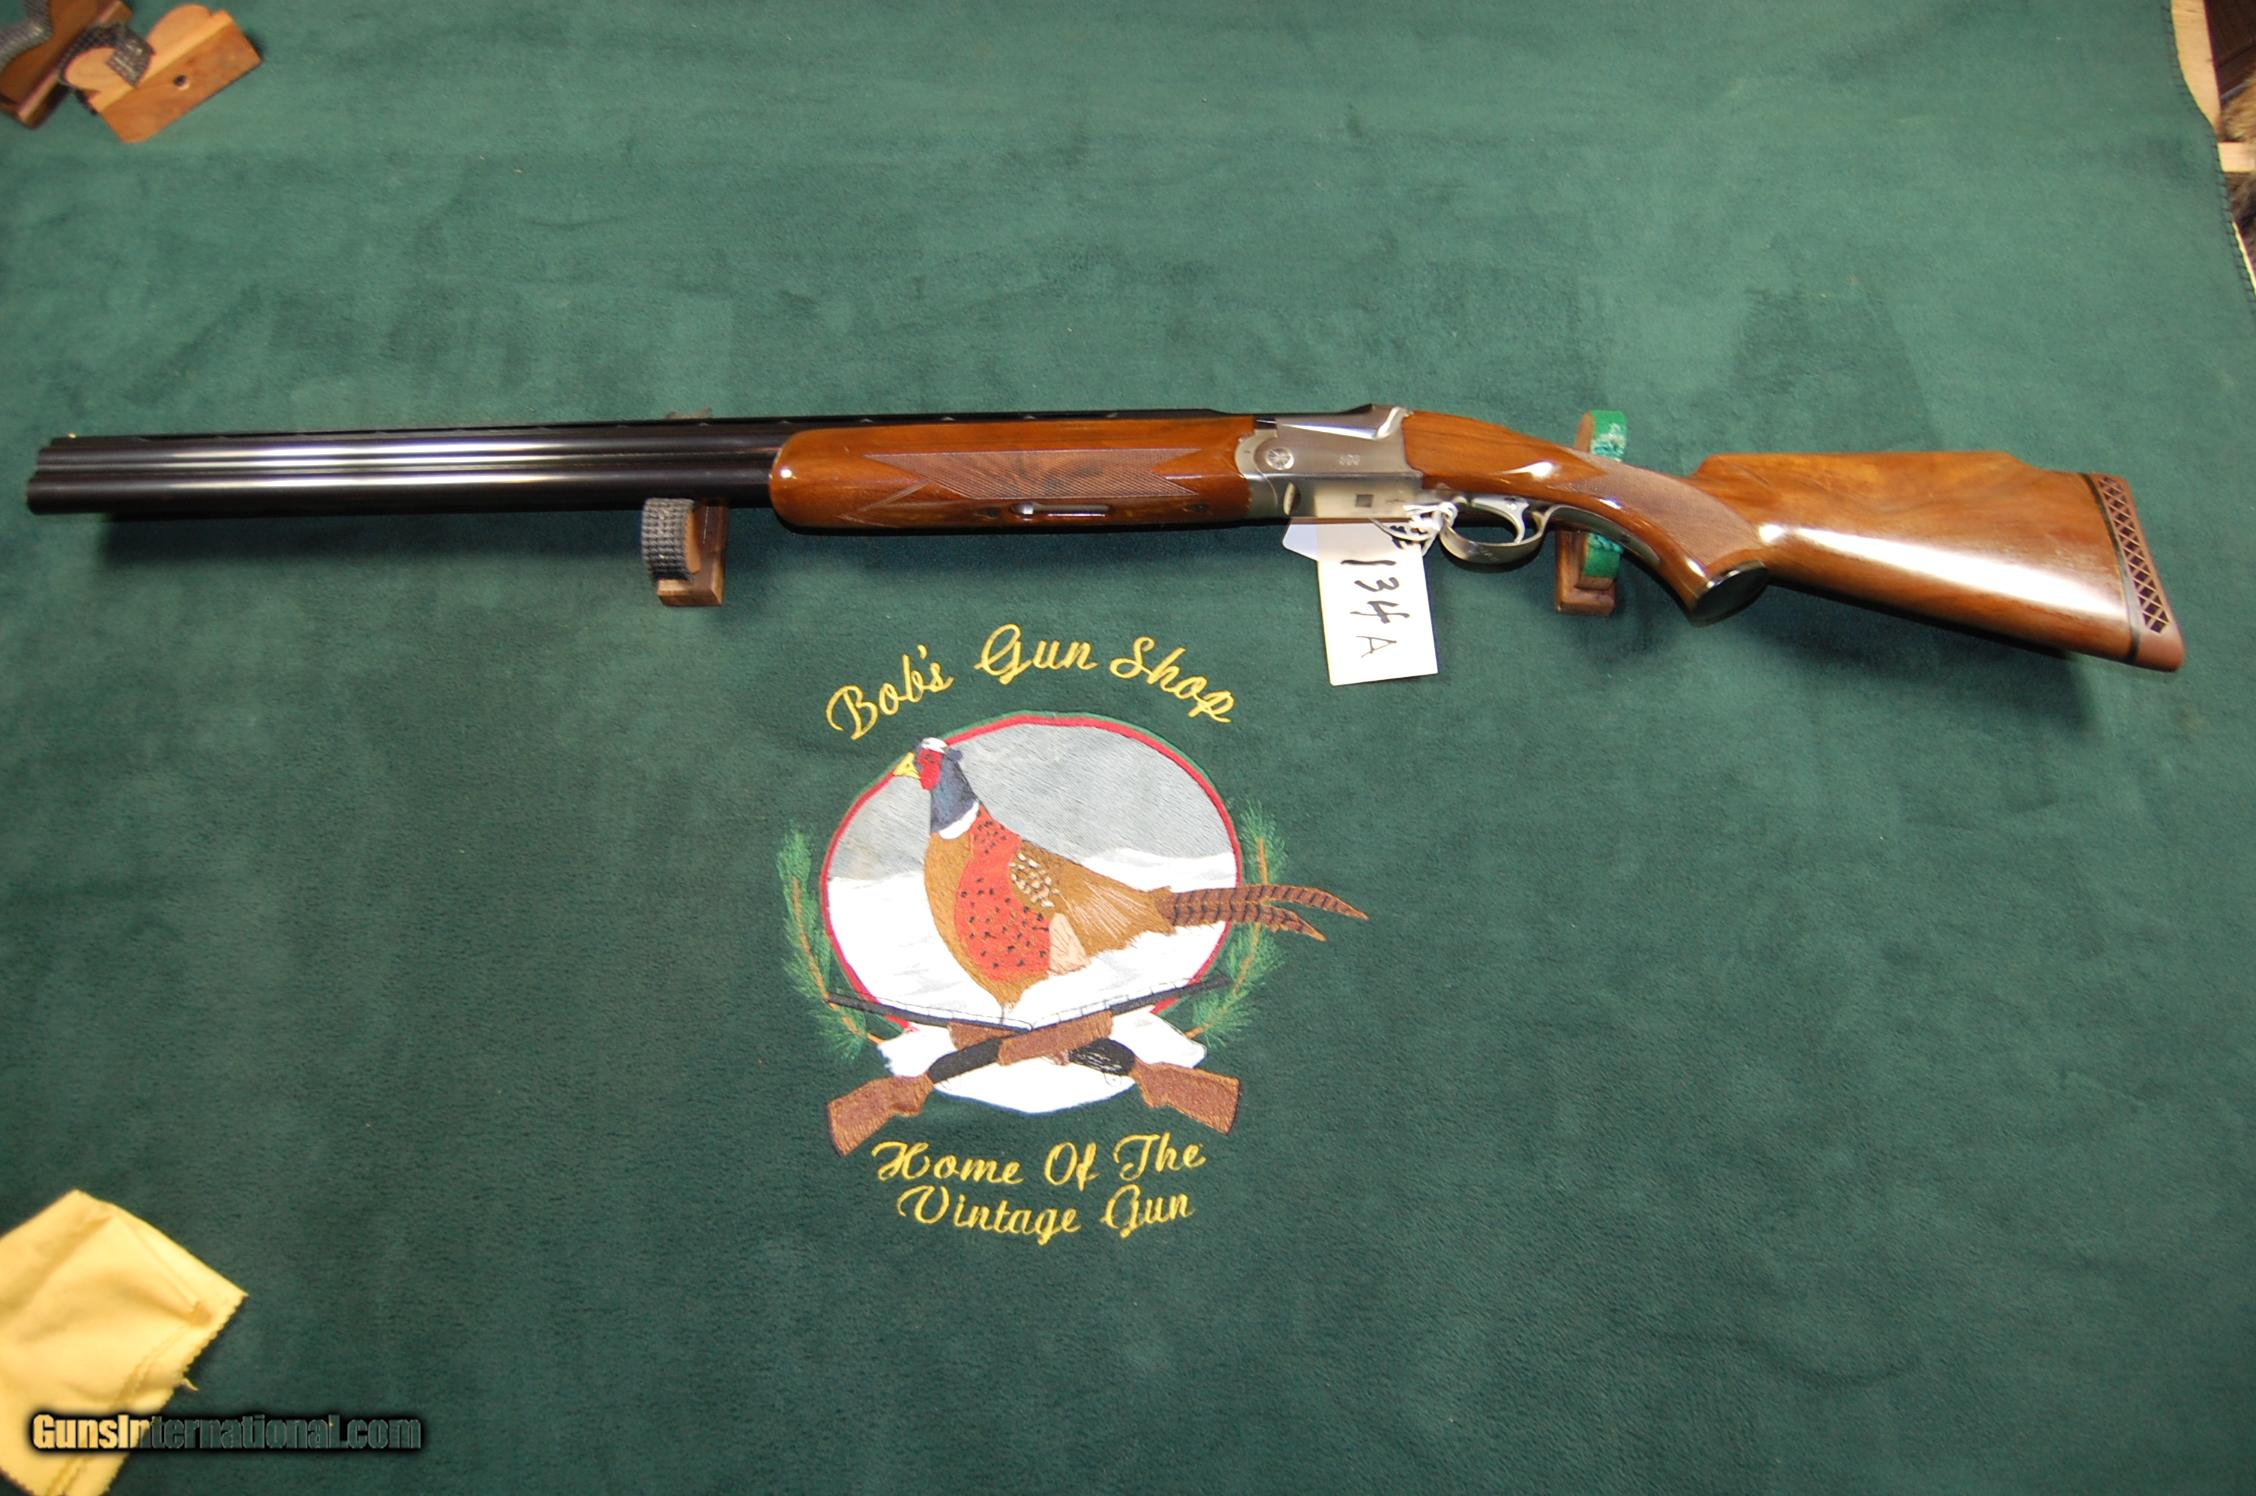 SKB Trap Gun Model 505